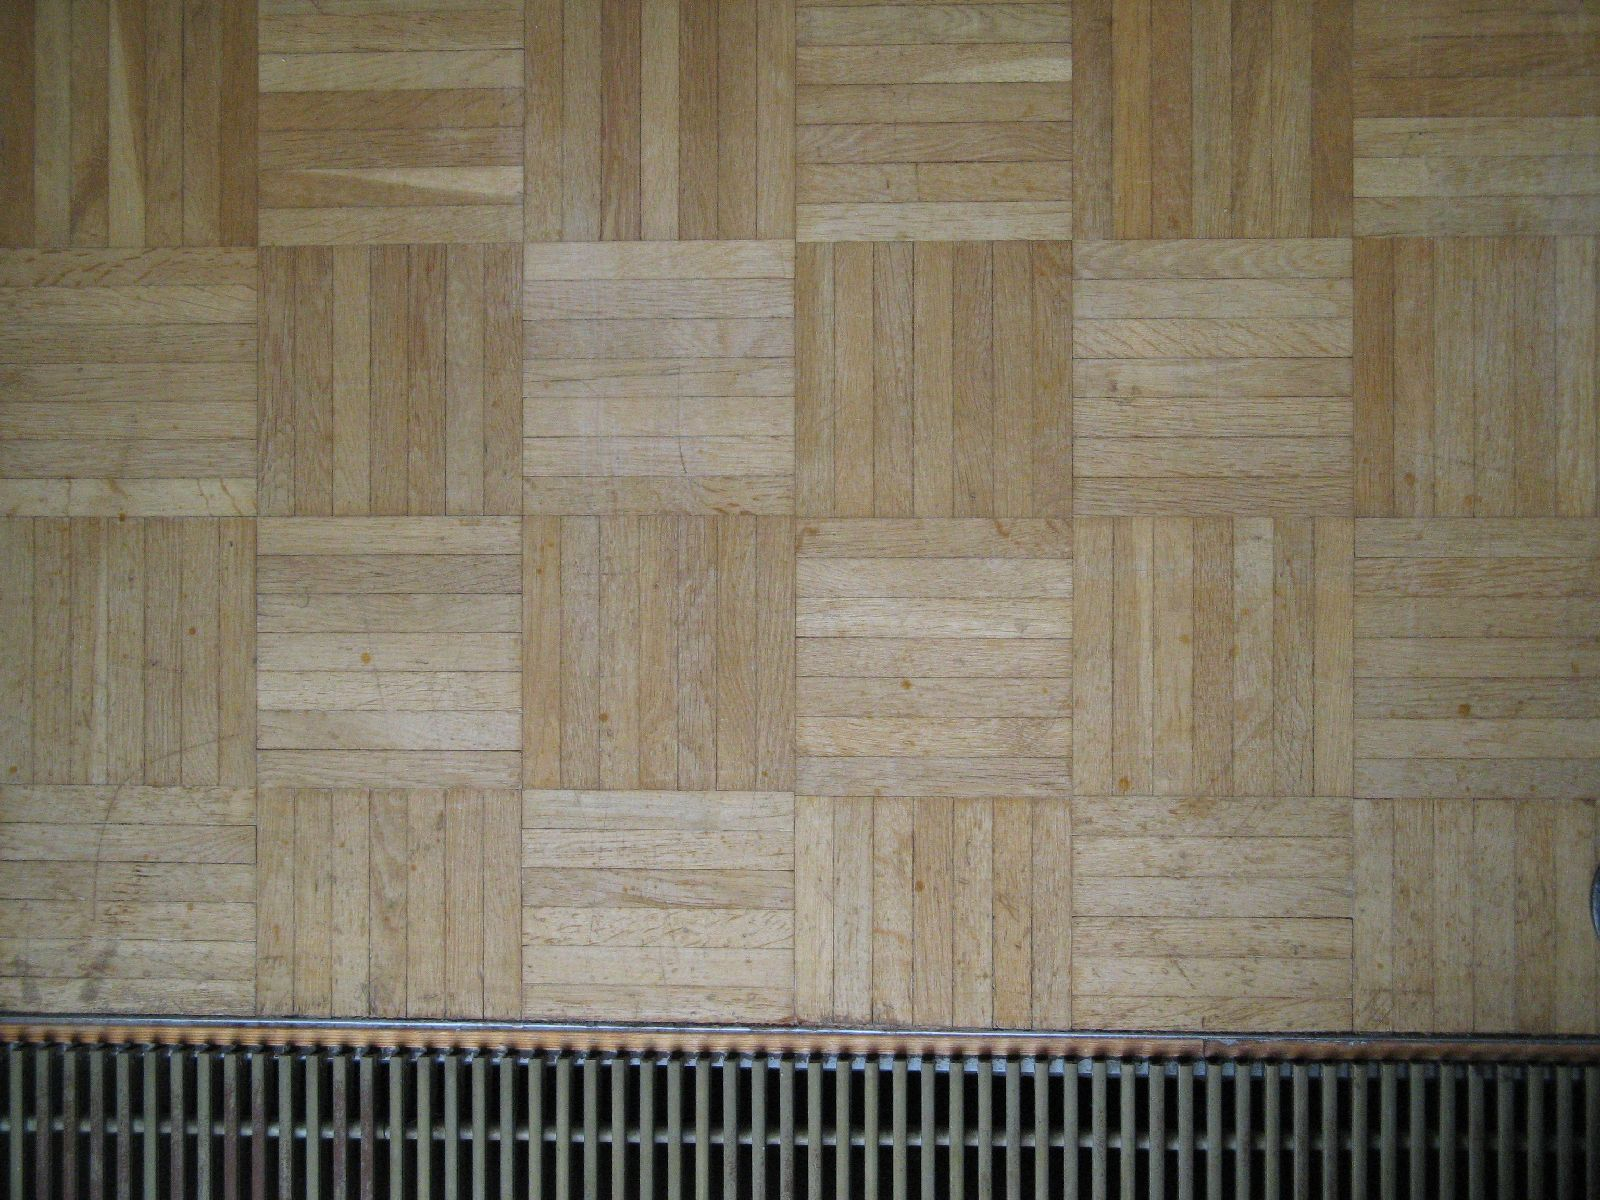 Wood_Textures_B_5800